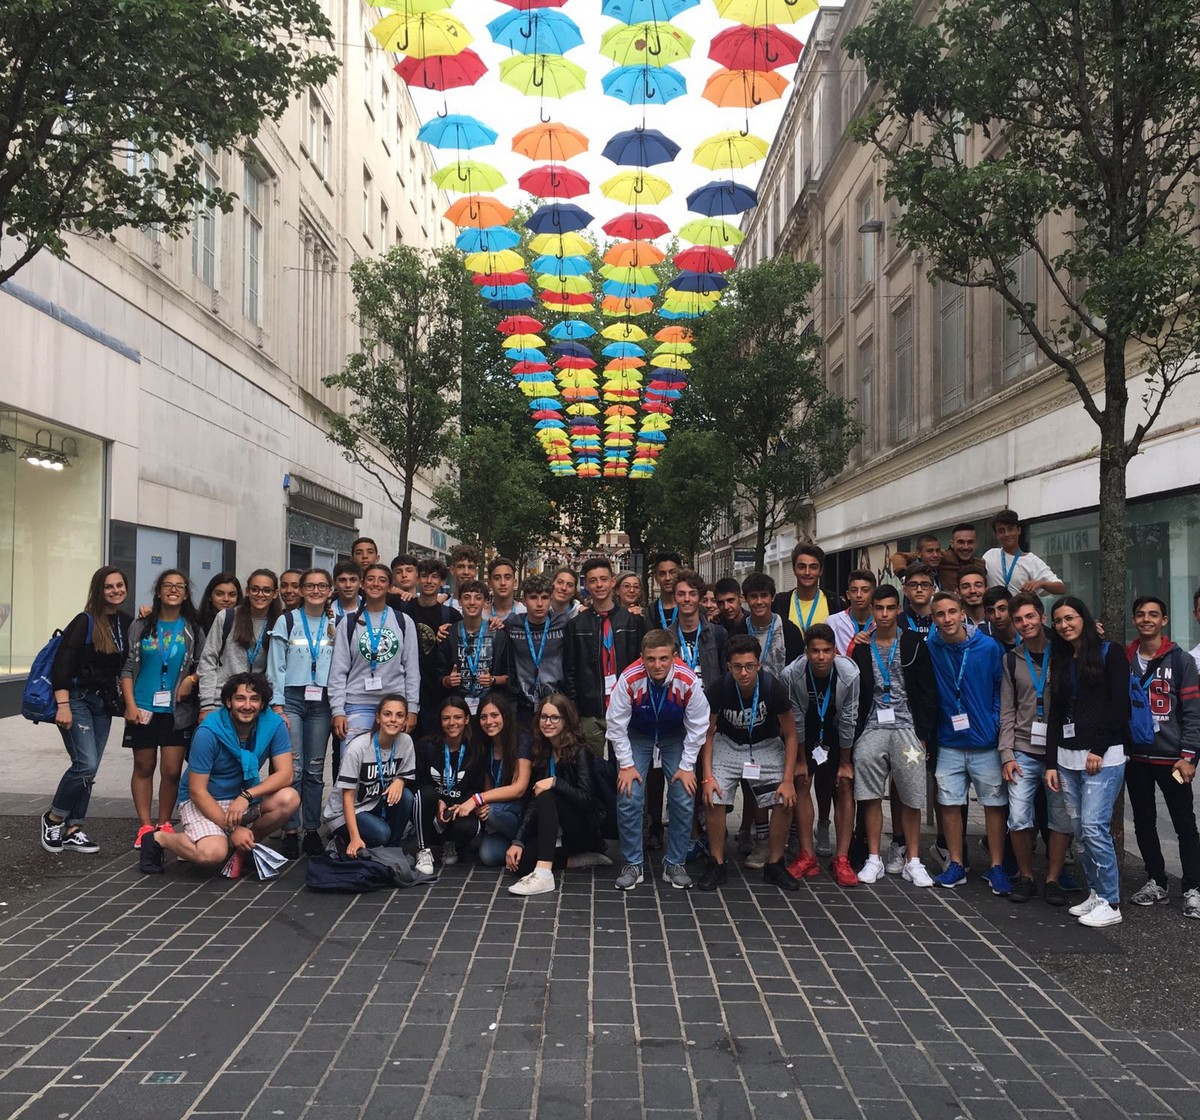 study live 2017 Archivi - Giocamondo Study-STUDYLIVE_LIVERPOOL_TURNO1_GIORNO5_FOTO11